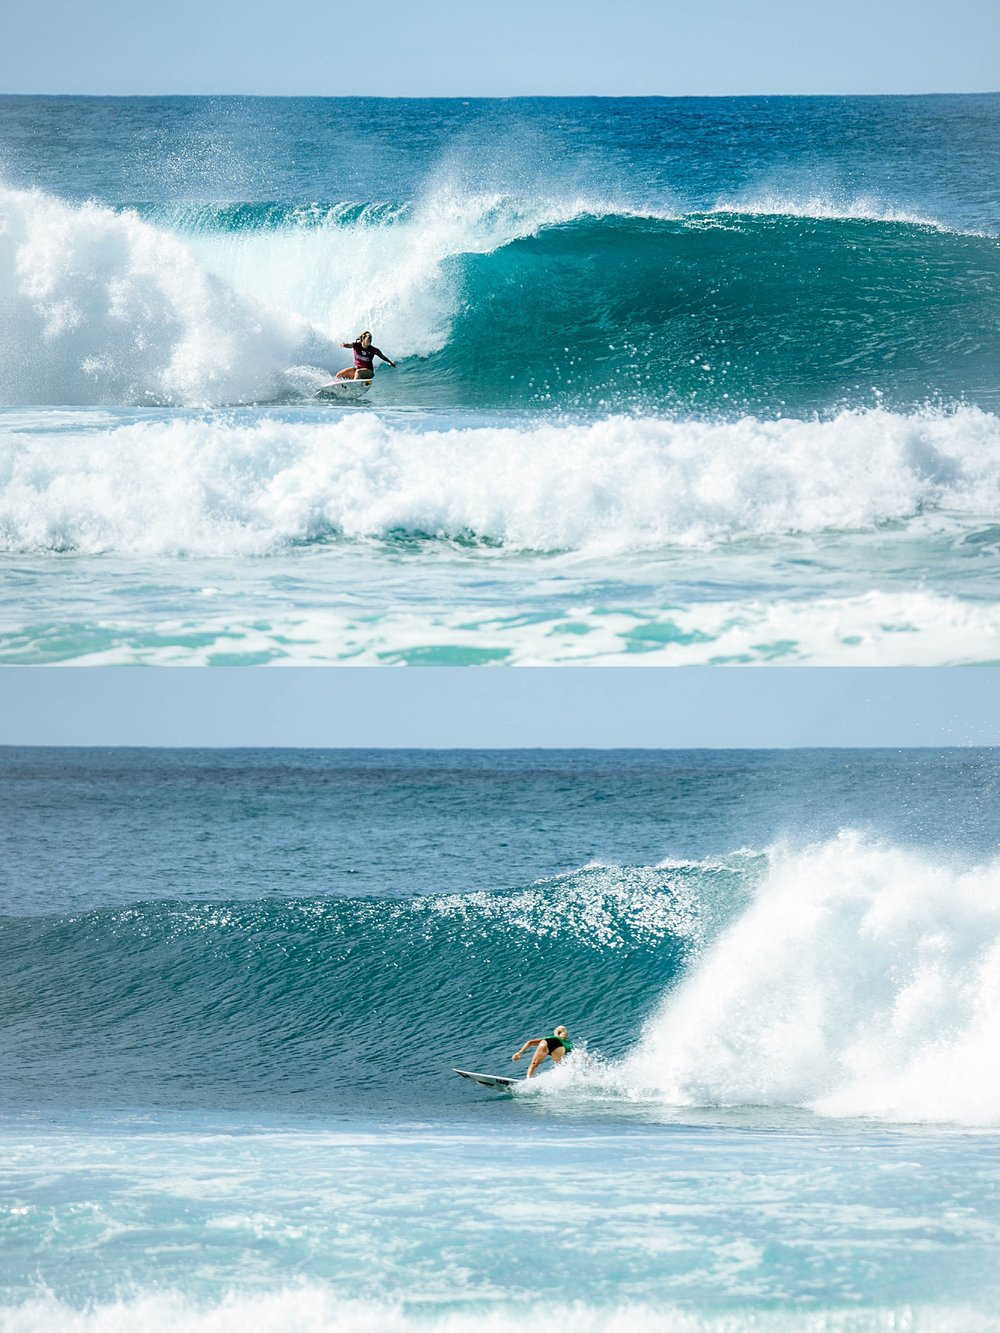 Travel Surf and Travel Lifestyle Photographer Kelee Bovelle @keleeb - Billabong Pipe Masters 2018 North Shore Oahu Hawaii_0022.jpg